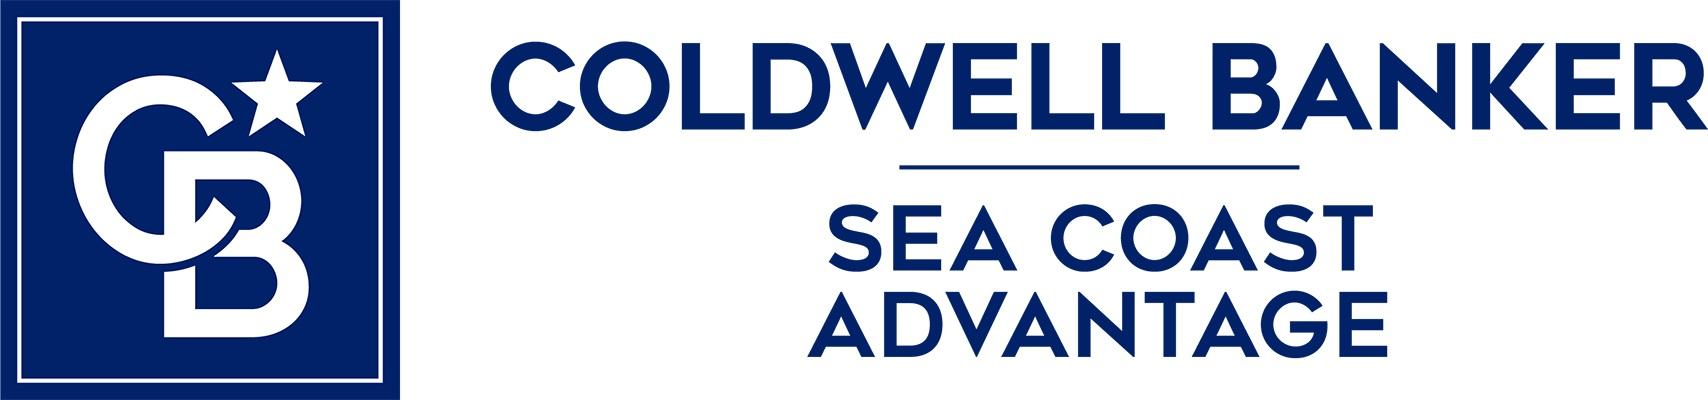 Paul Allsup - Coldwell Banker Sea Coast Advantage Realty Logo